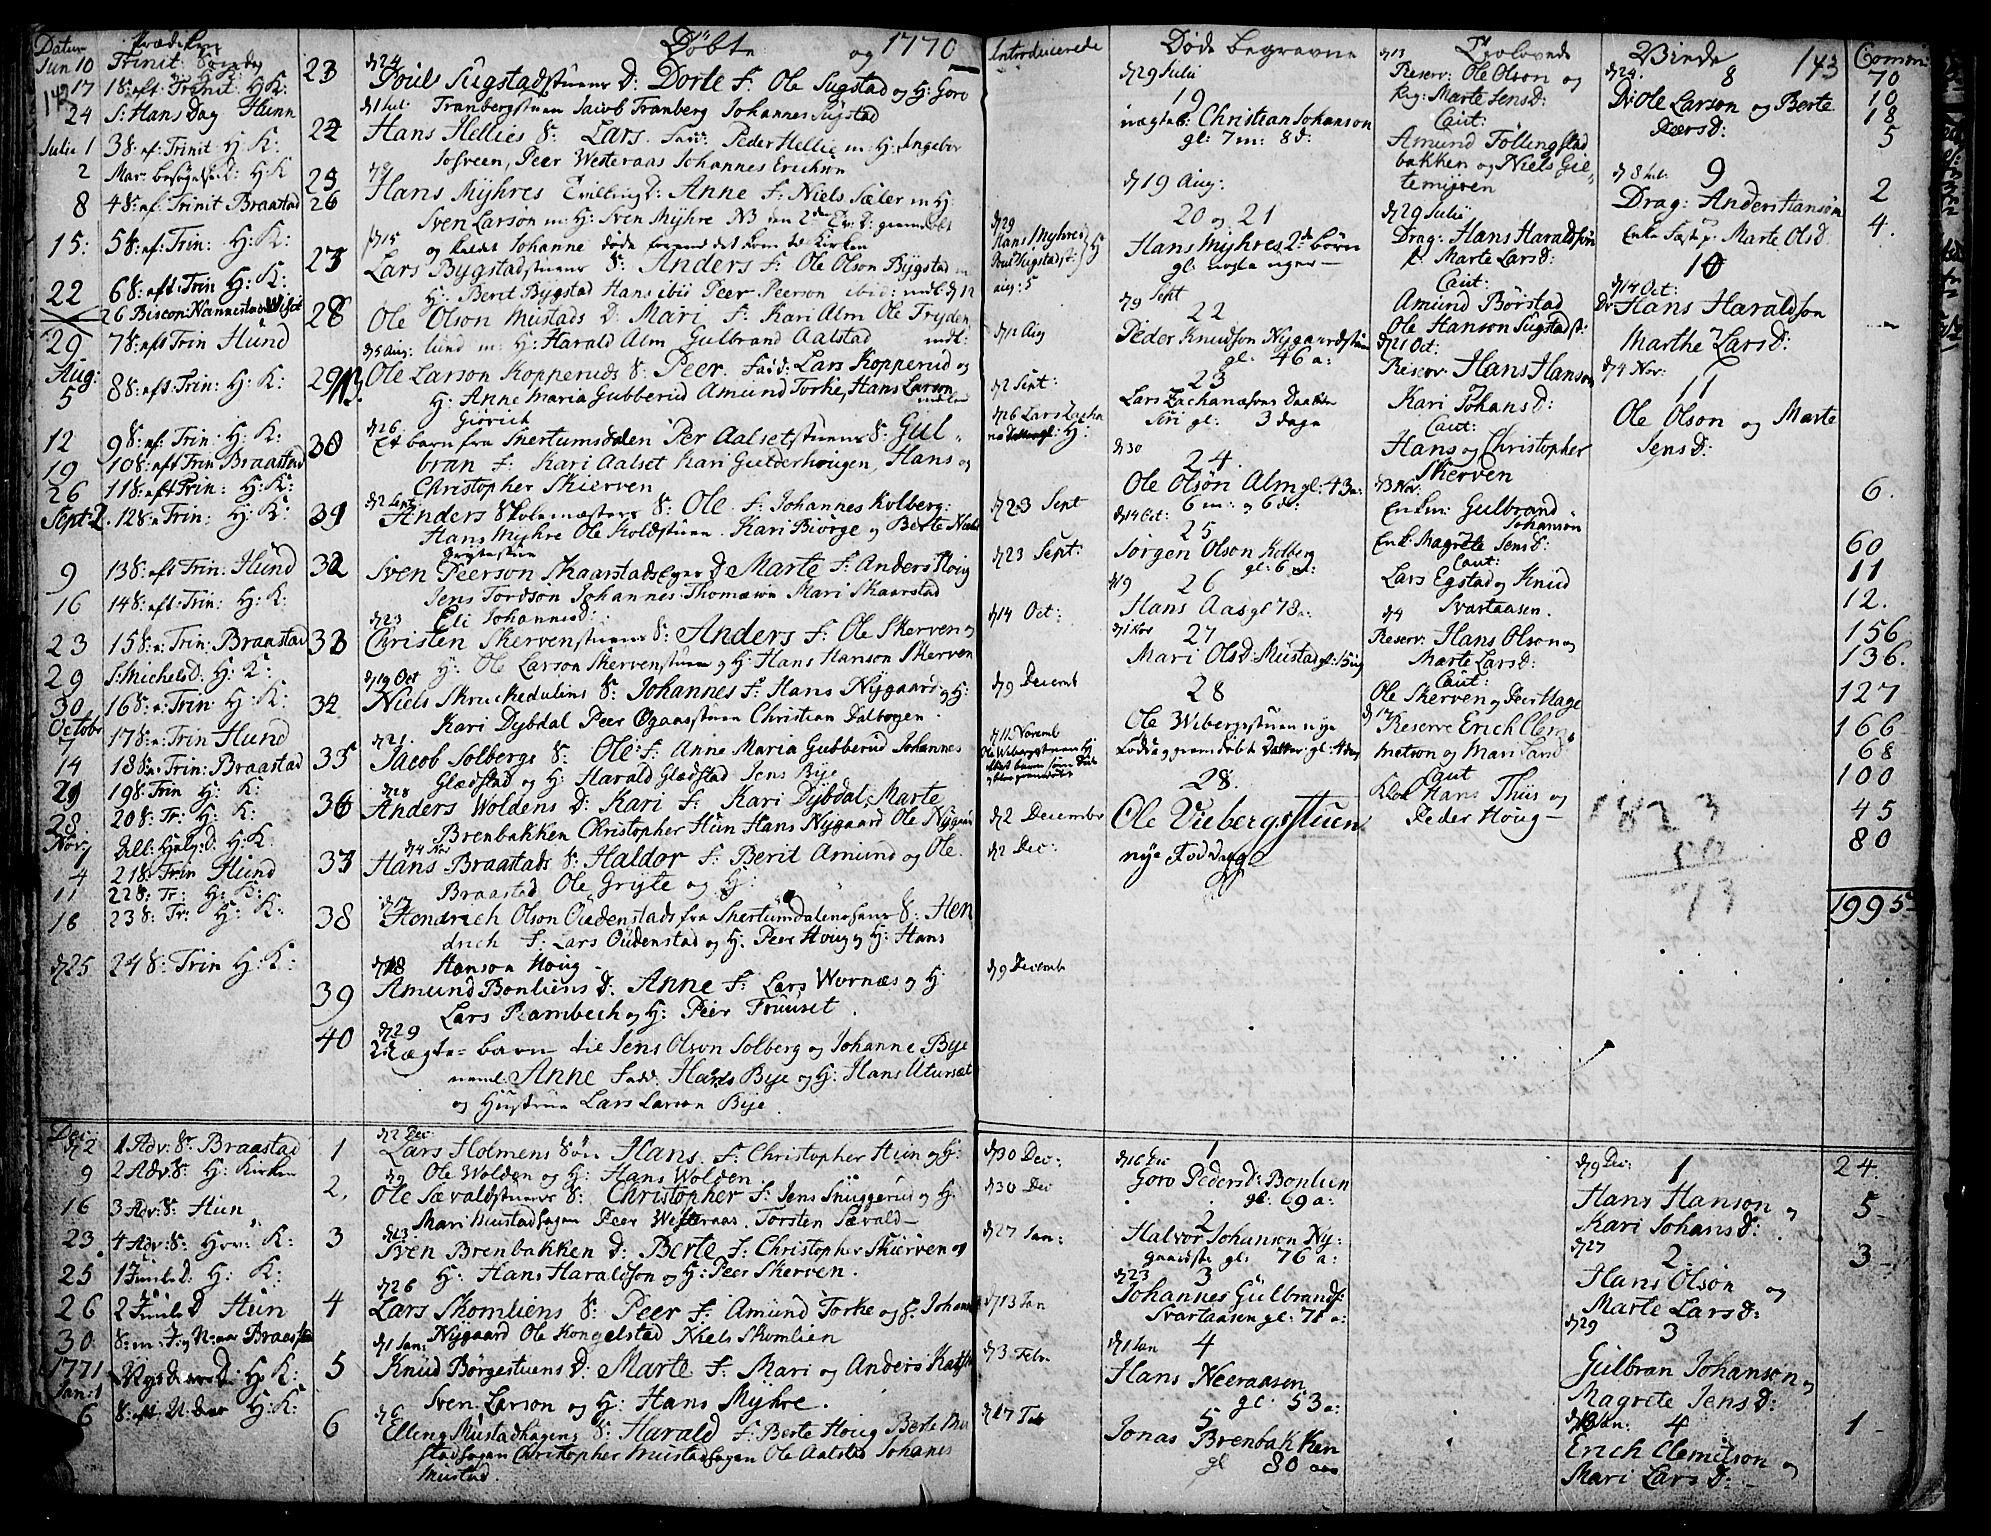 SAH, Vardal prestekontor, H/Ha/Haa/L0002: Ministerialbok nr. 2, 1748-1776, s. 142-143